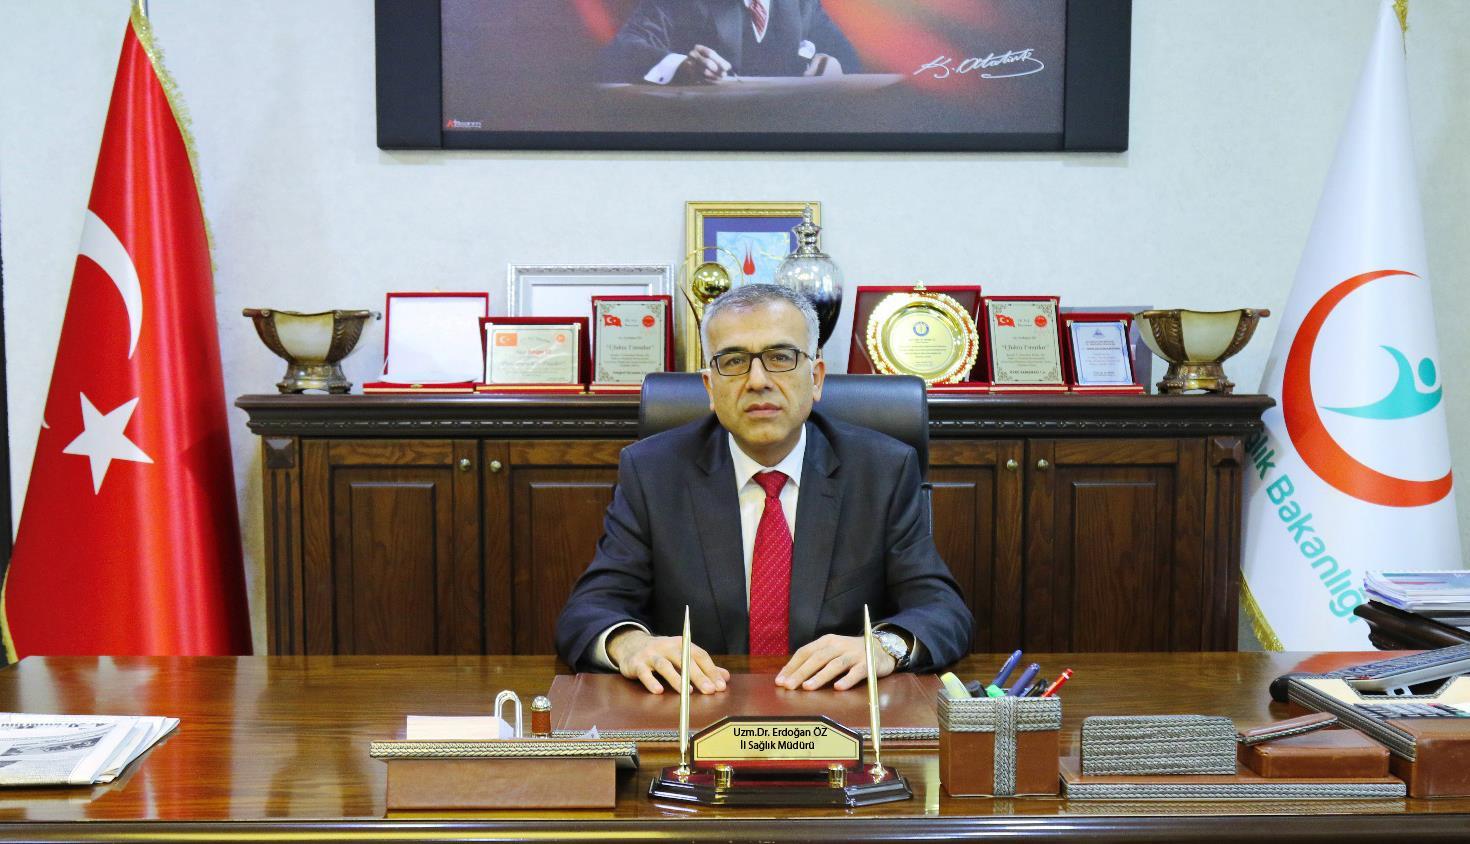 Uzm.Dr. Erdoğan ÖZ